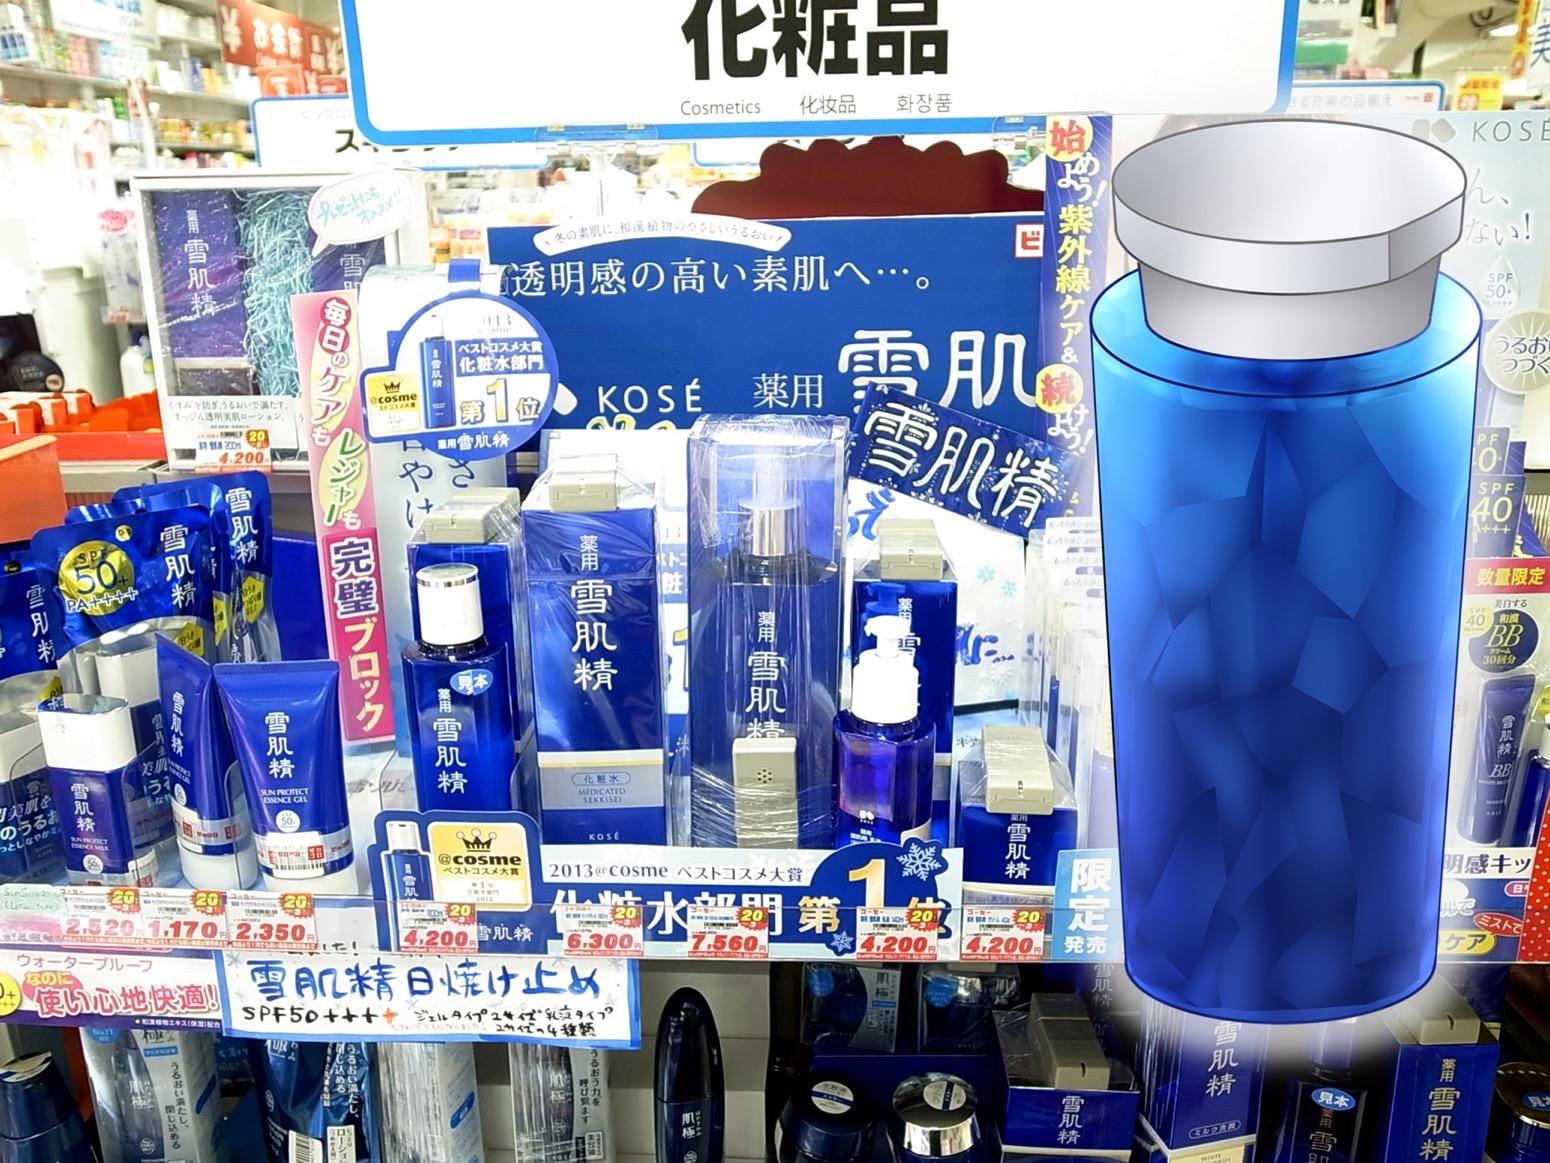 BICCAMERA Okayama Station Store